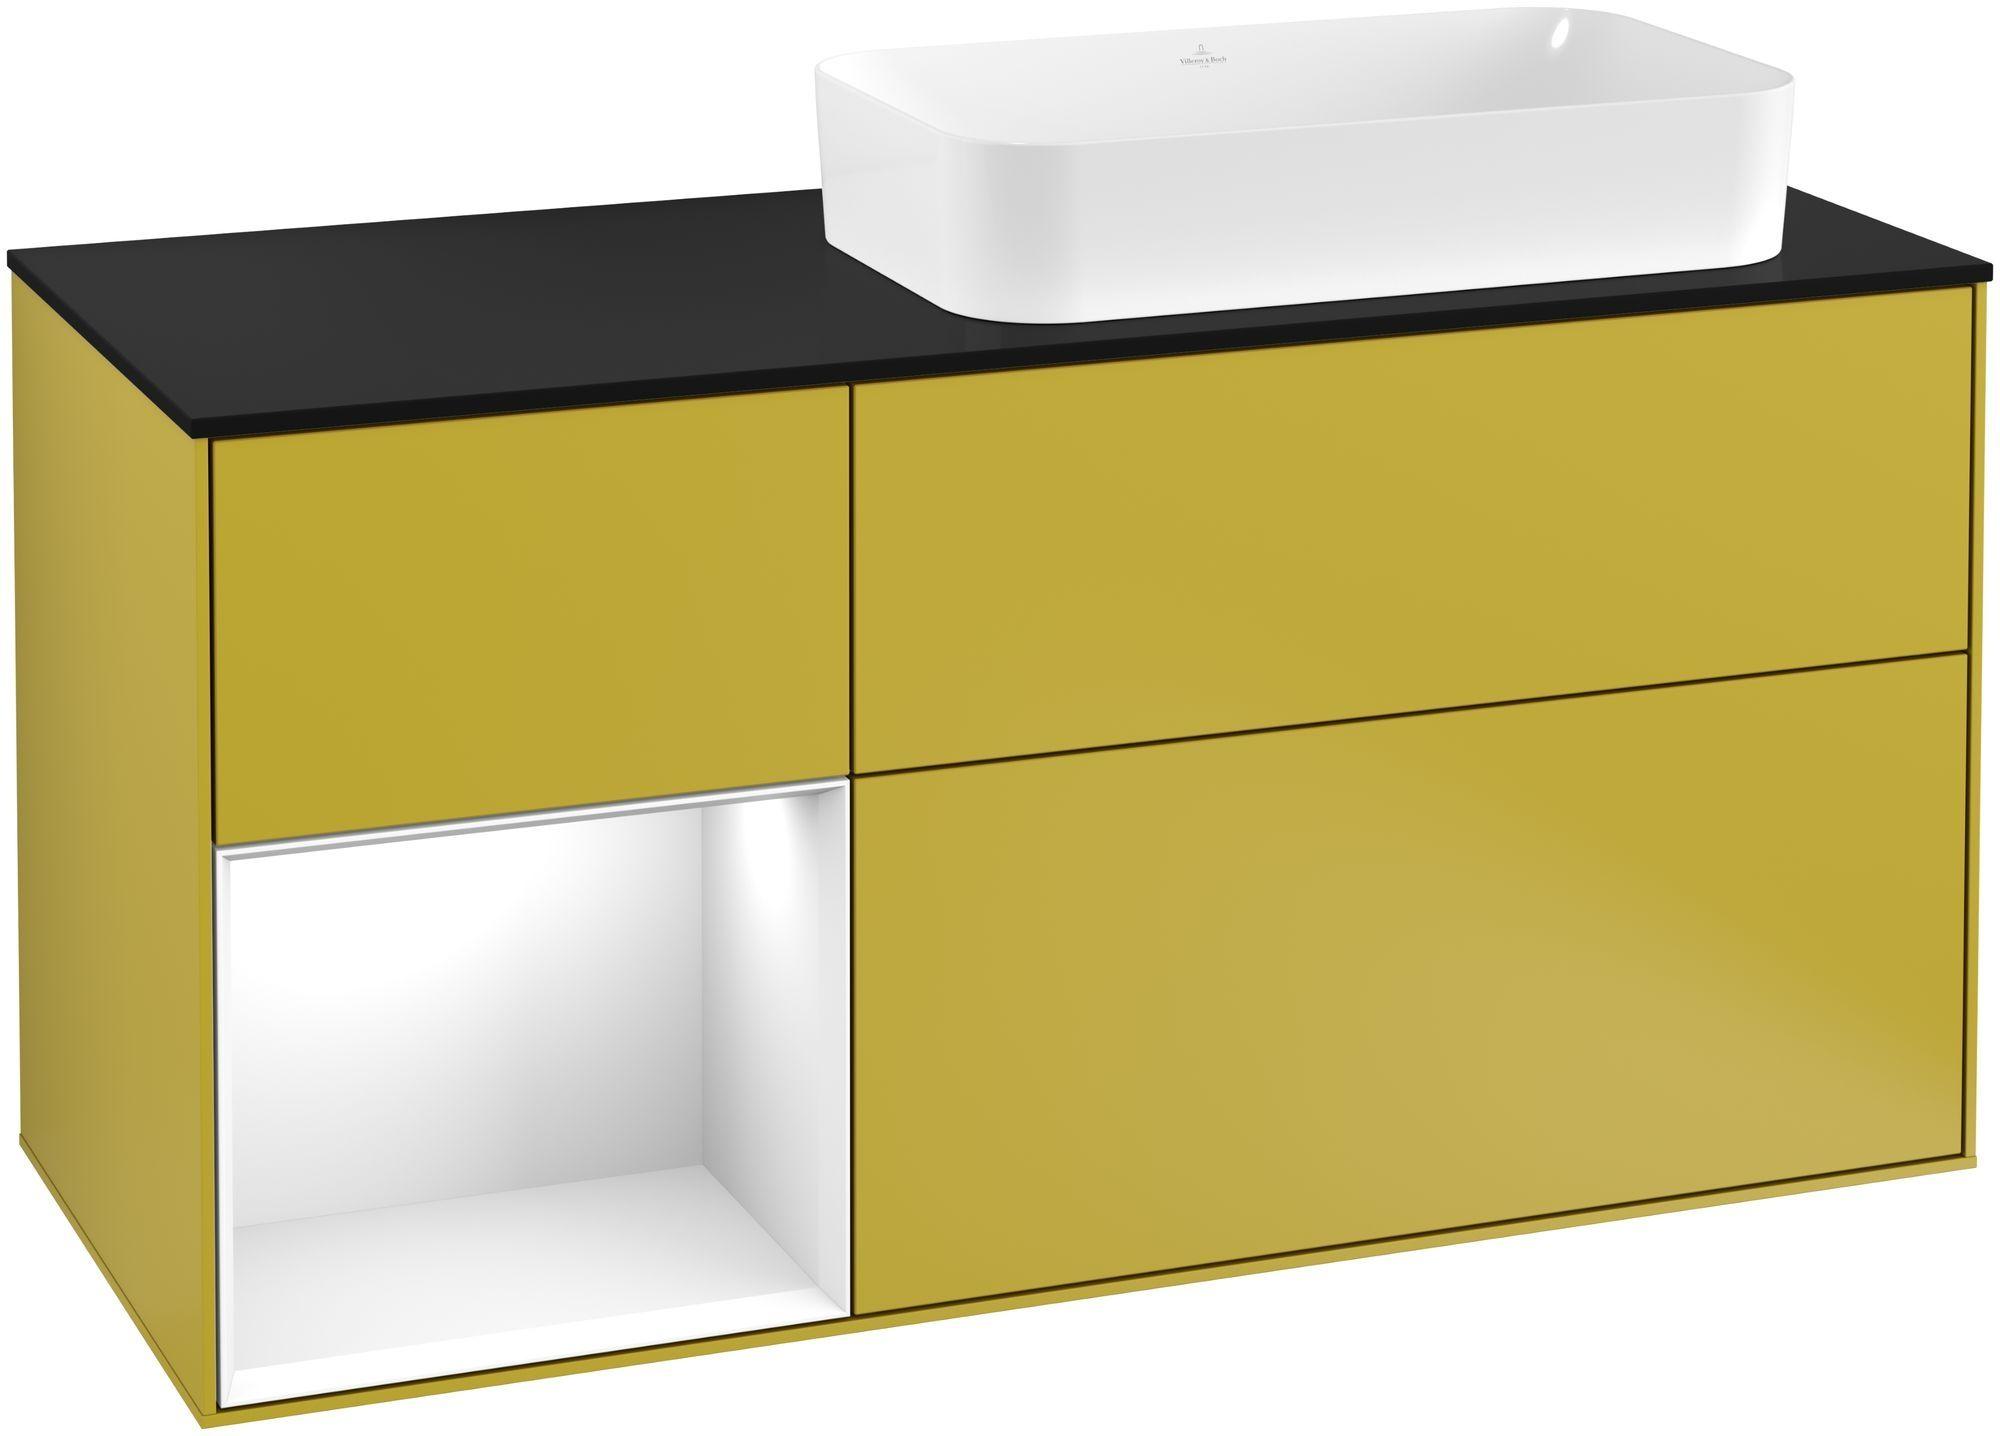 Villeroy & Boch Finion F27 Waschtischunterschrank mit Regalelement 3 Auszüge Waschtisch rechts LED-Beleuchtung B:120xH:60,3xT:50,1cm Front, Korpus: Sun, Regal: Glossy White Lack, Glasplatte: Black Matt F272GFHE